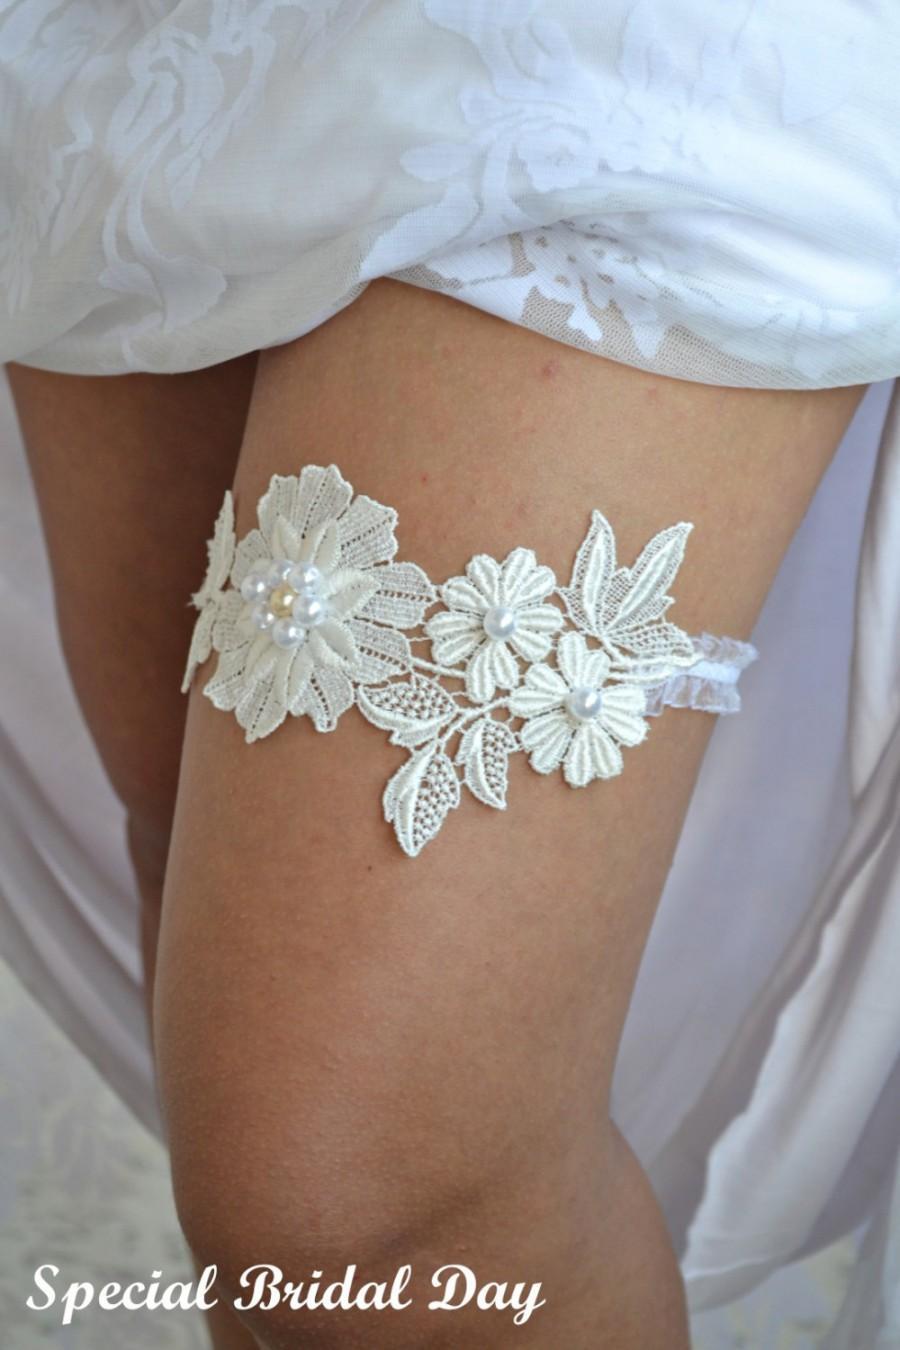 Mariage - Ivory Lace Wedding Garter Set Handknitted With Cream Pearls - Handmade Garter Set